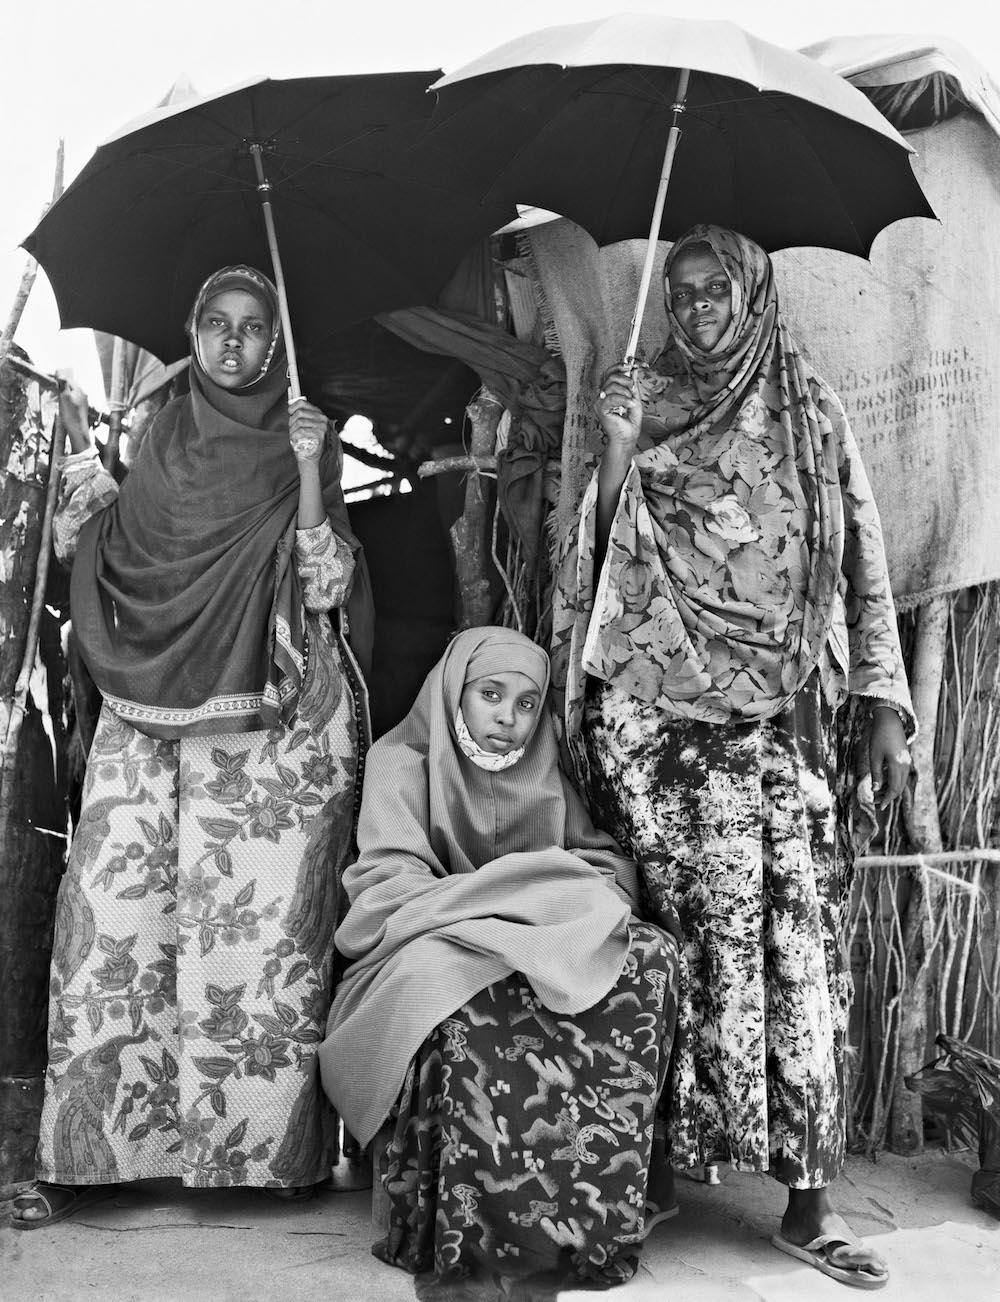 'Human Archipelago'   Teju Cole and Fazal Sheikh explore notions of hospitality in latest photo book